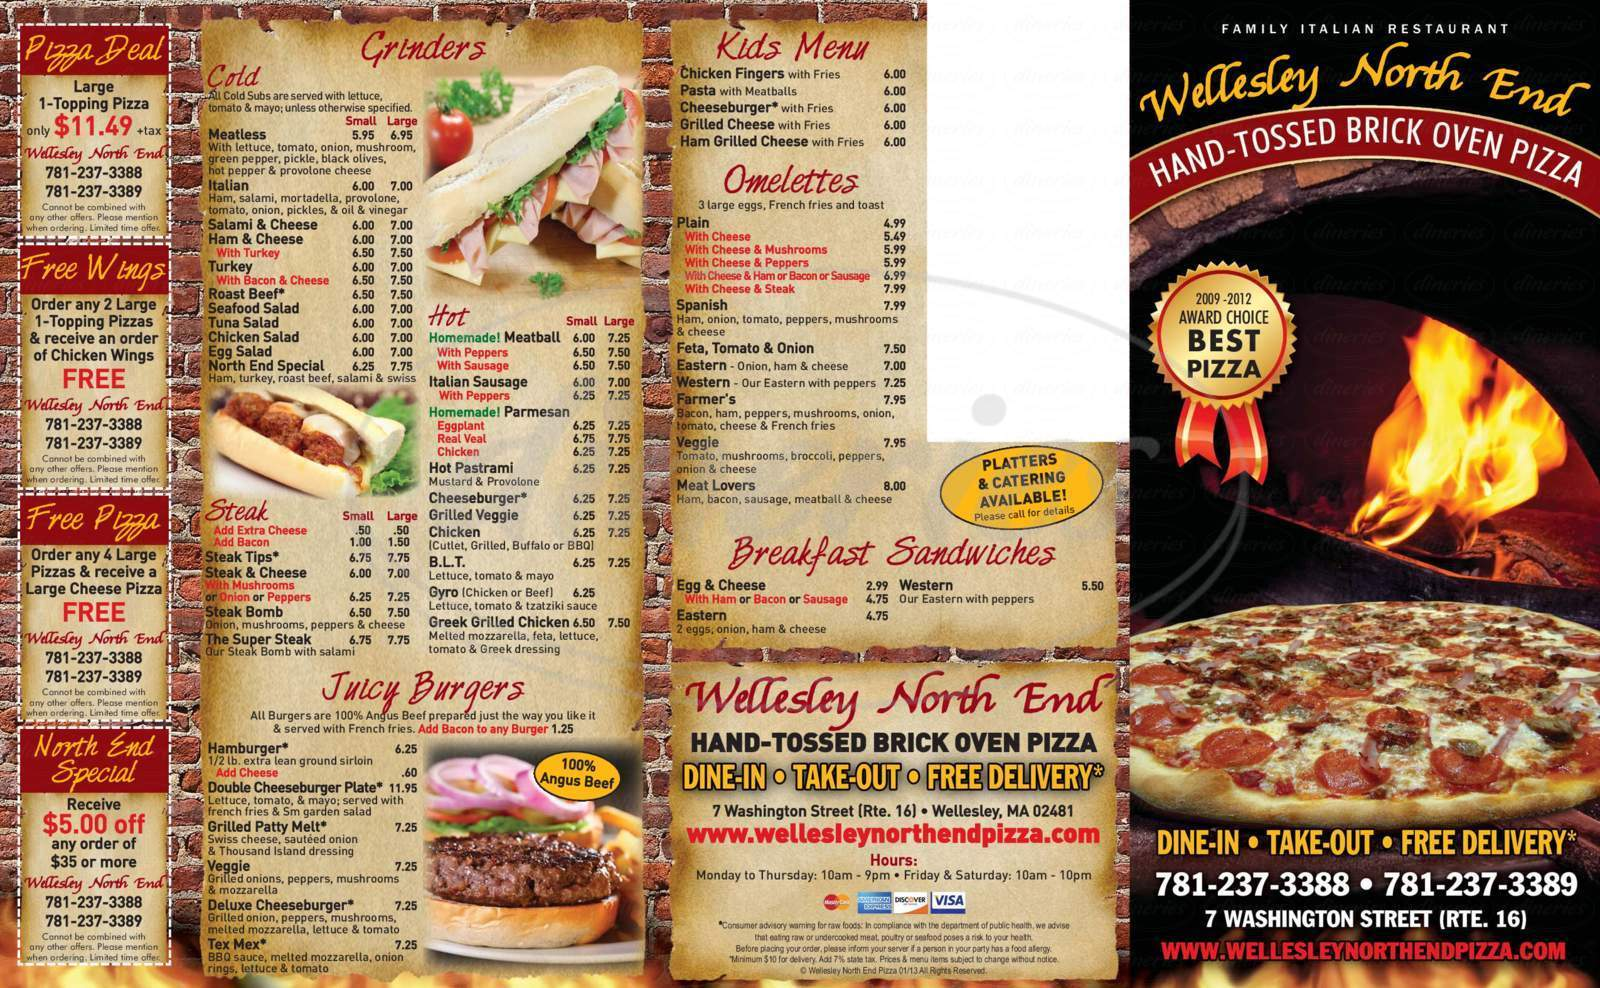 menu for Wellesley North End Pizza